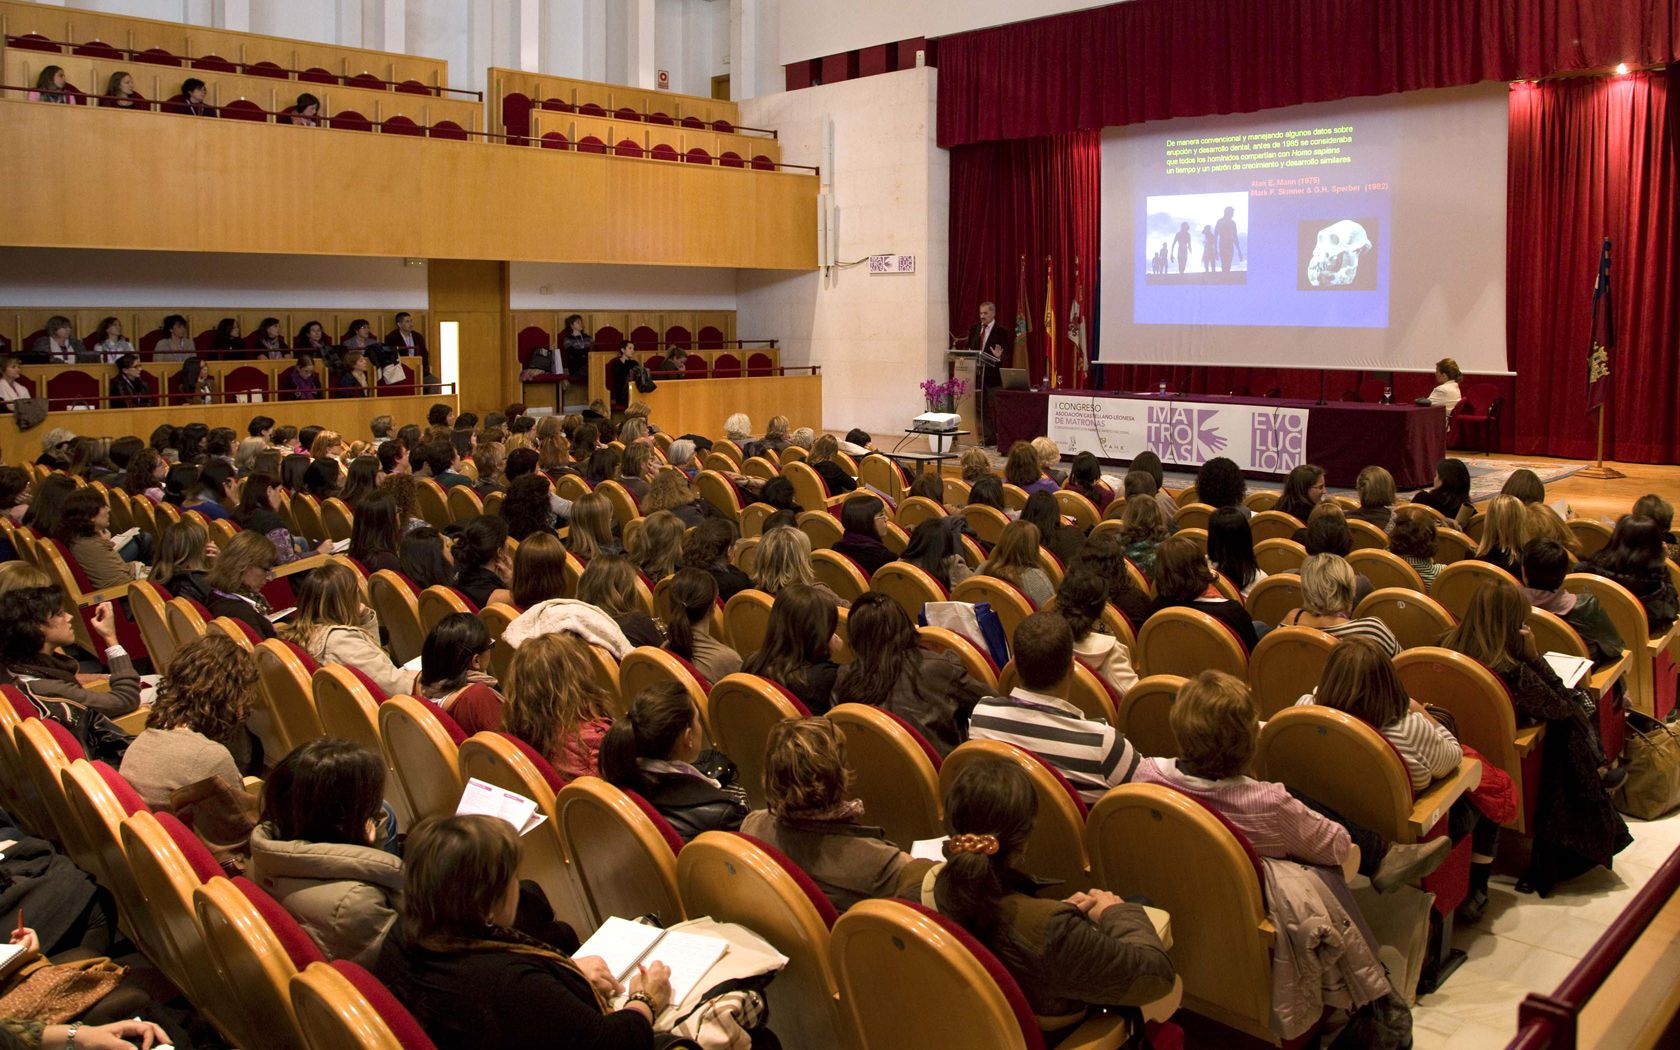 Fotógrafo de Congresos en Burgos